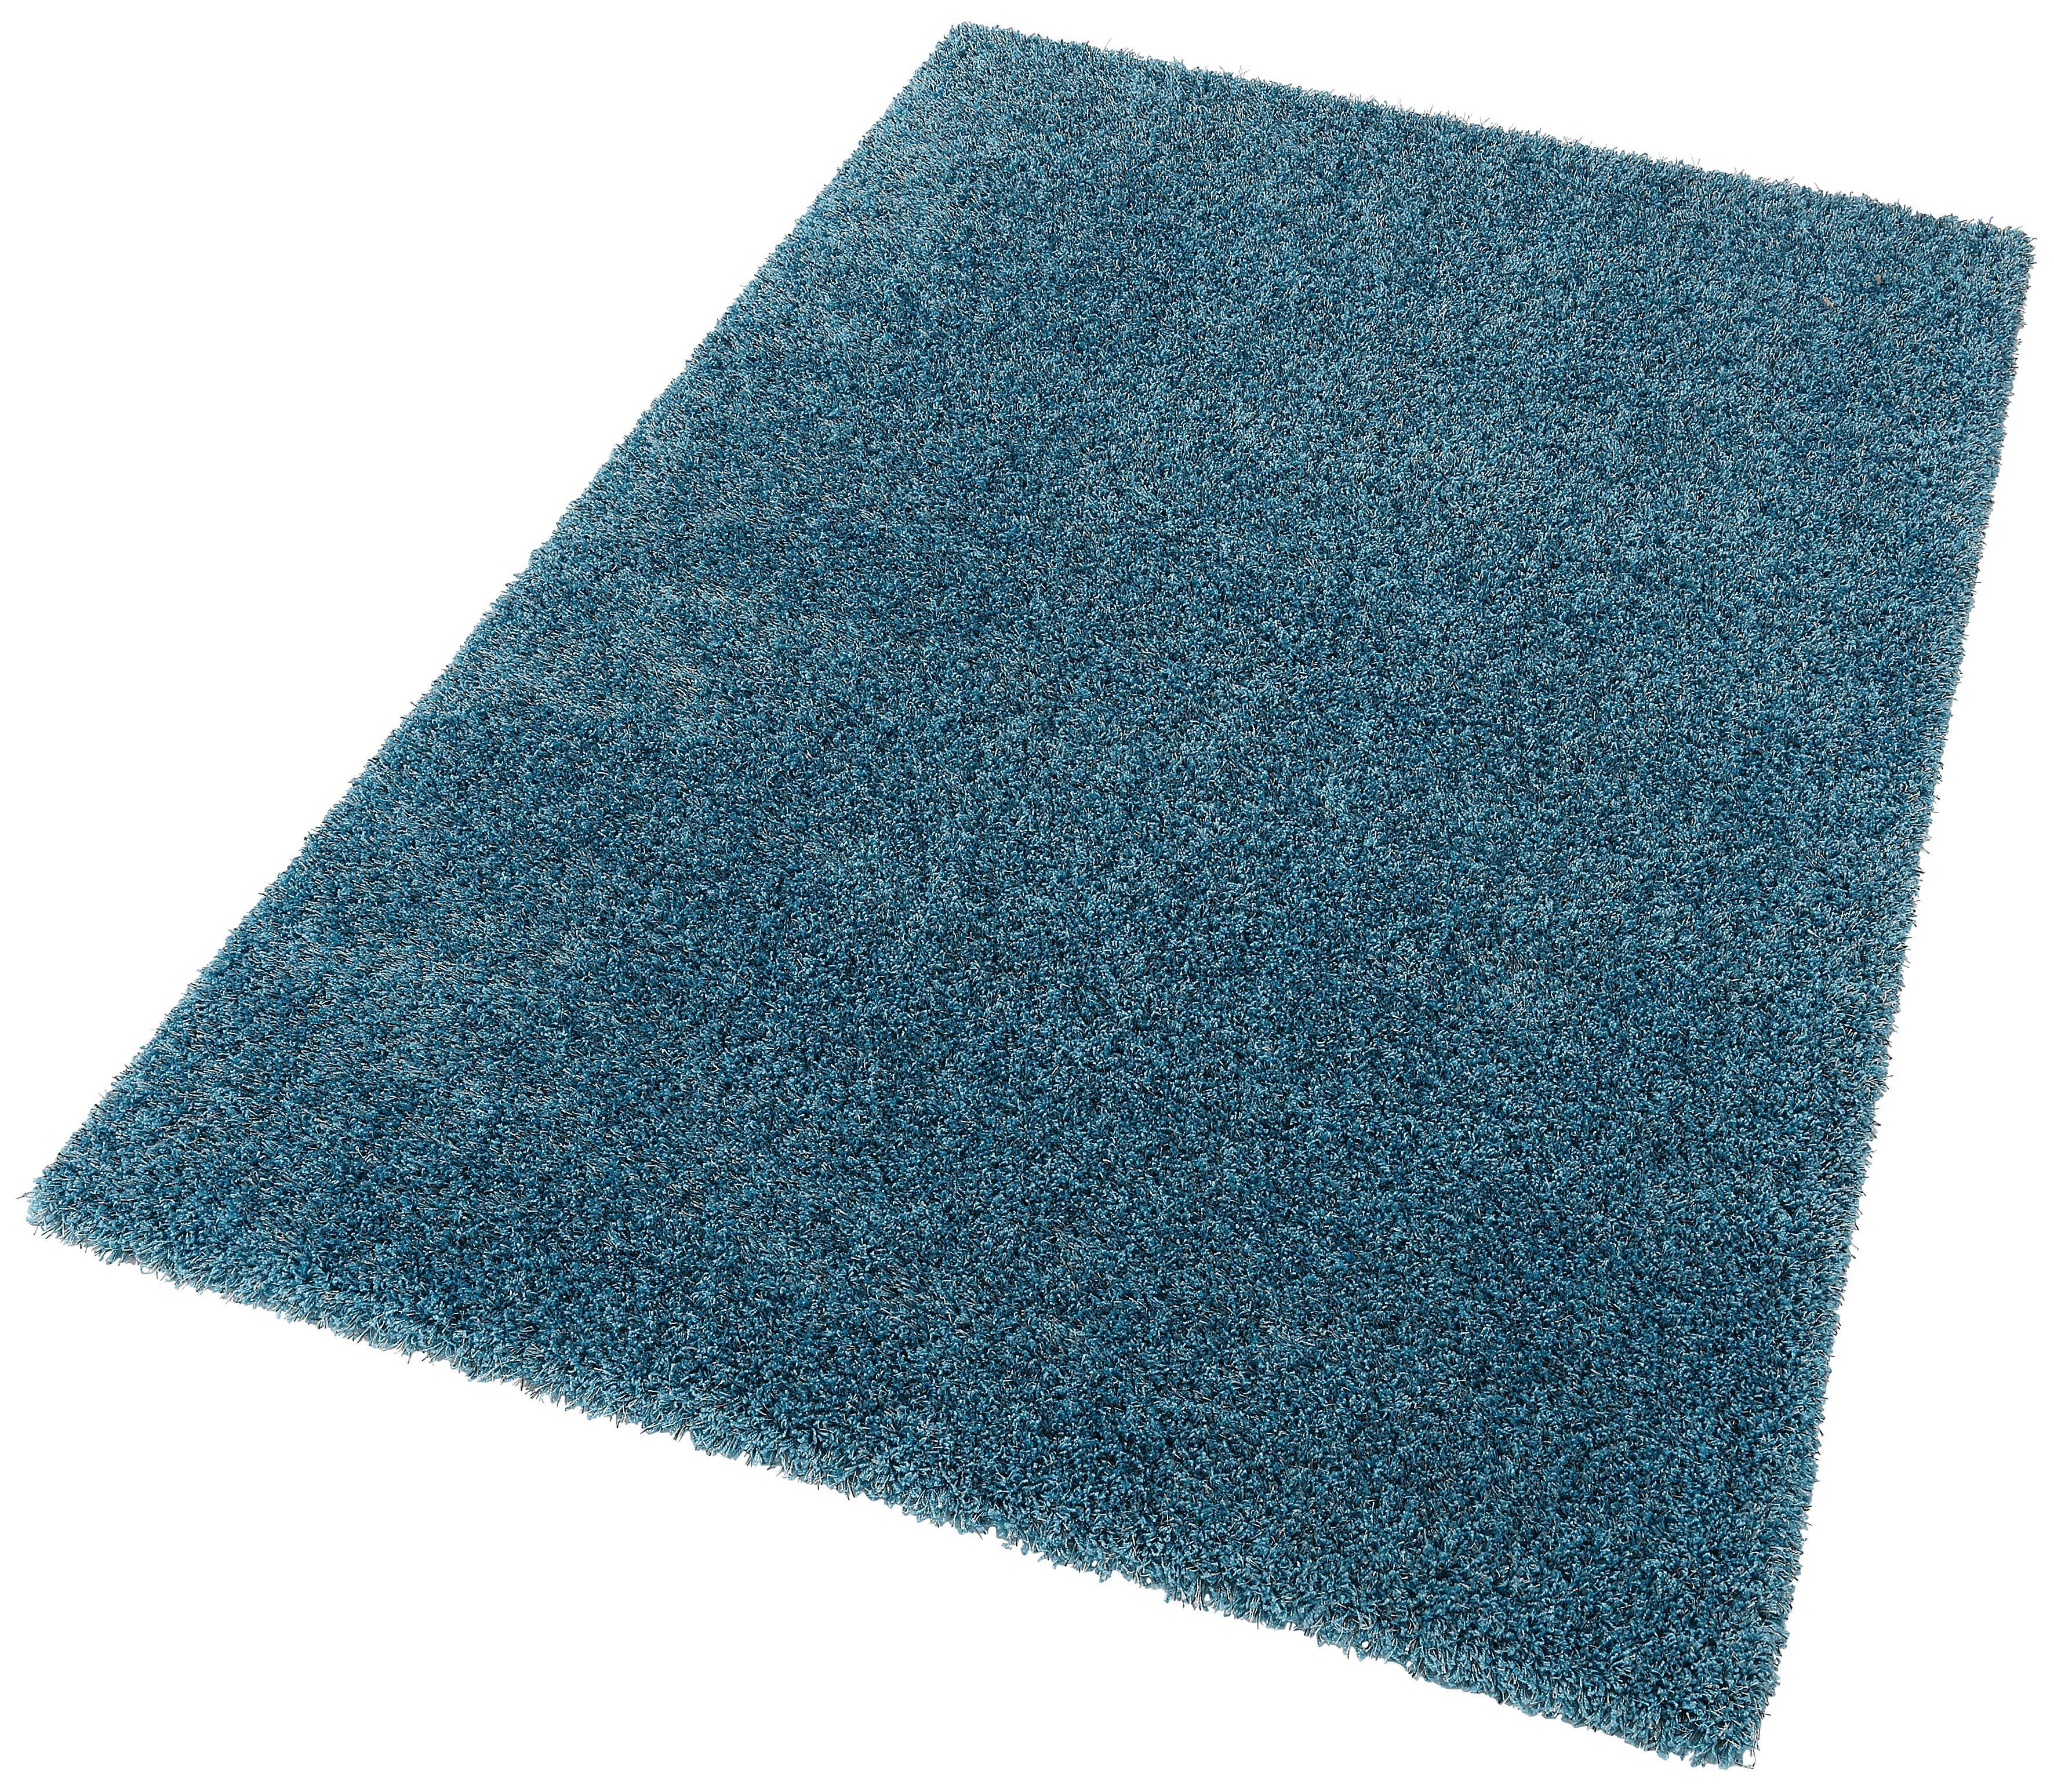 Hochflor-Teppich Cosy Glamour Esprit rechteckig Höhe 40 mm maschinell gewebt